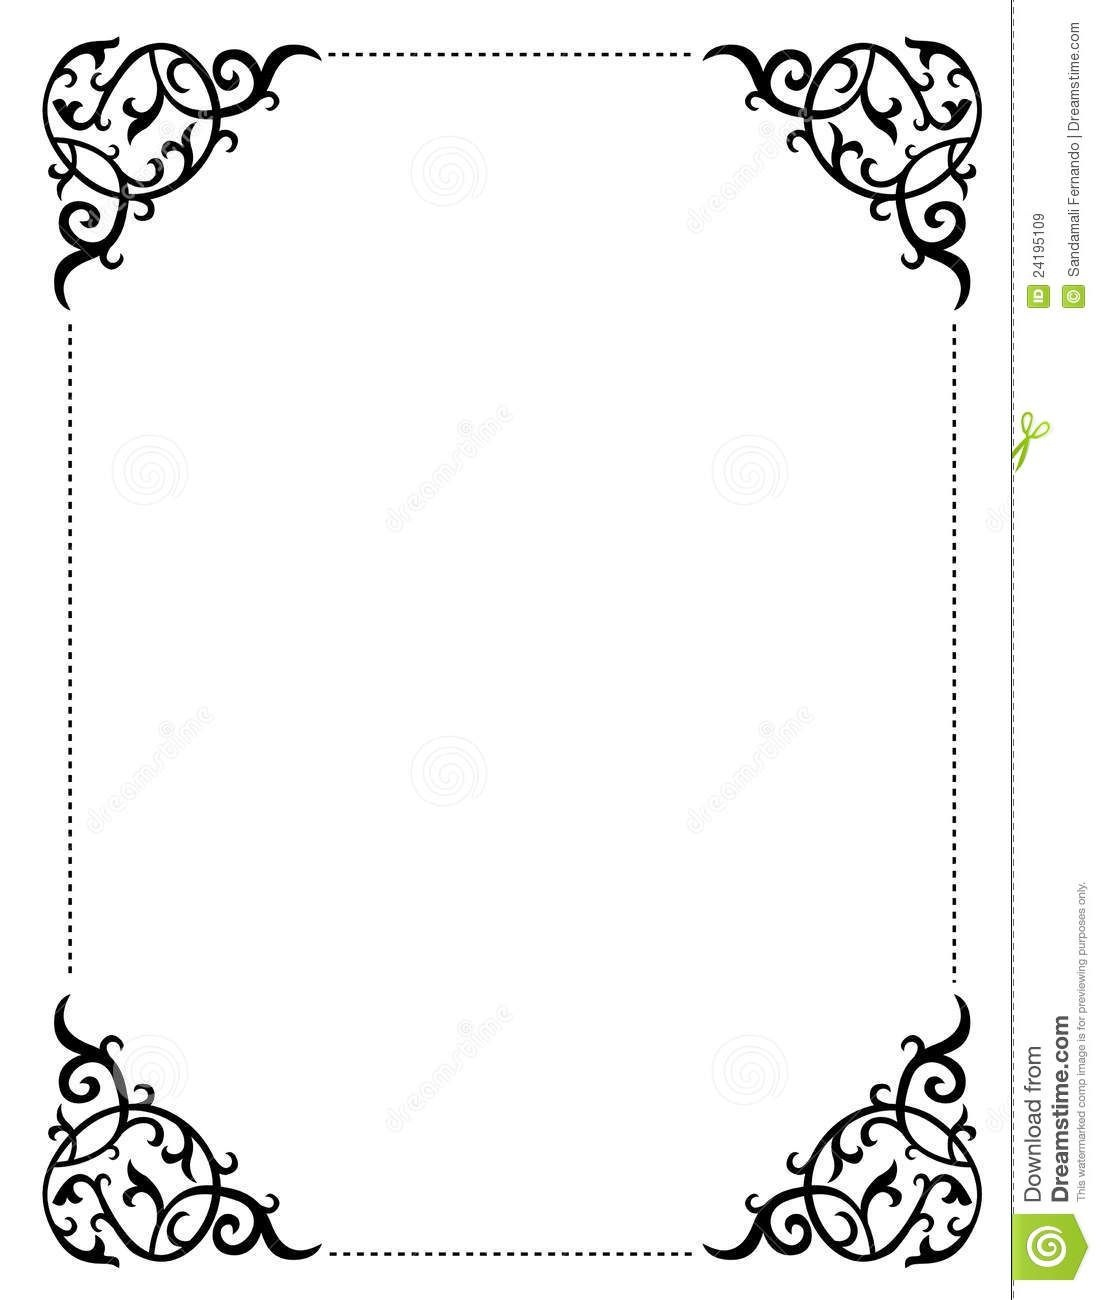 Free Printable Wedding Clip Art Borders And Backgrounds Invitation - Free Printable Wedding Scrolls